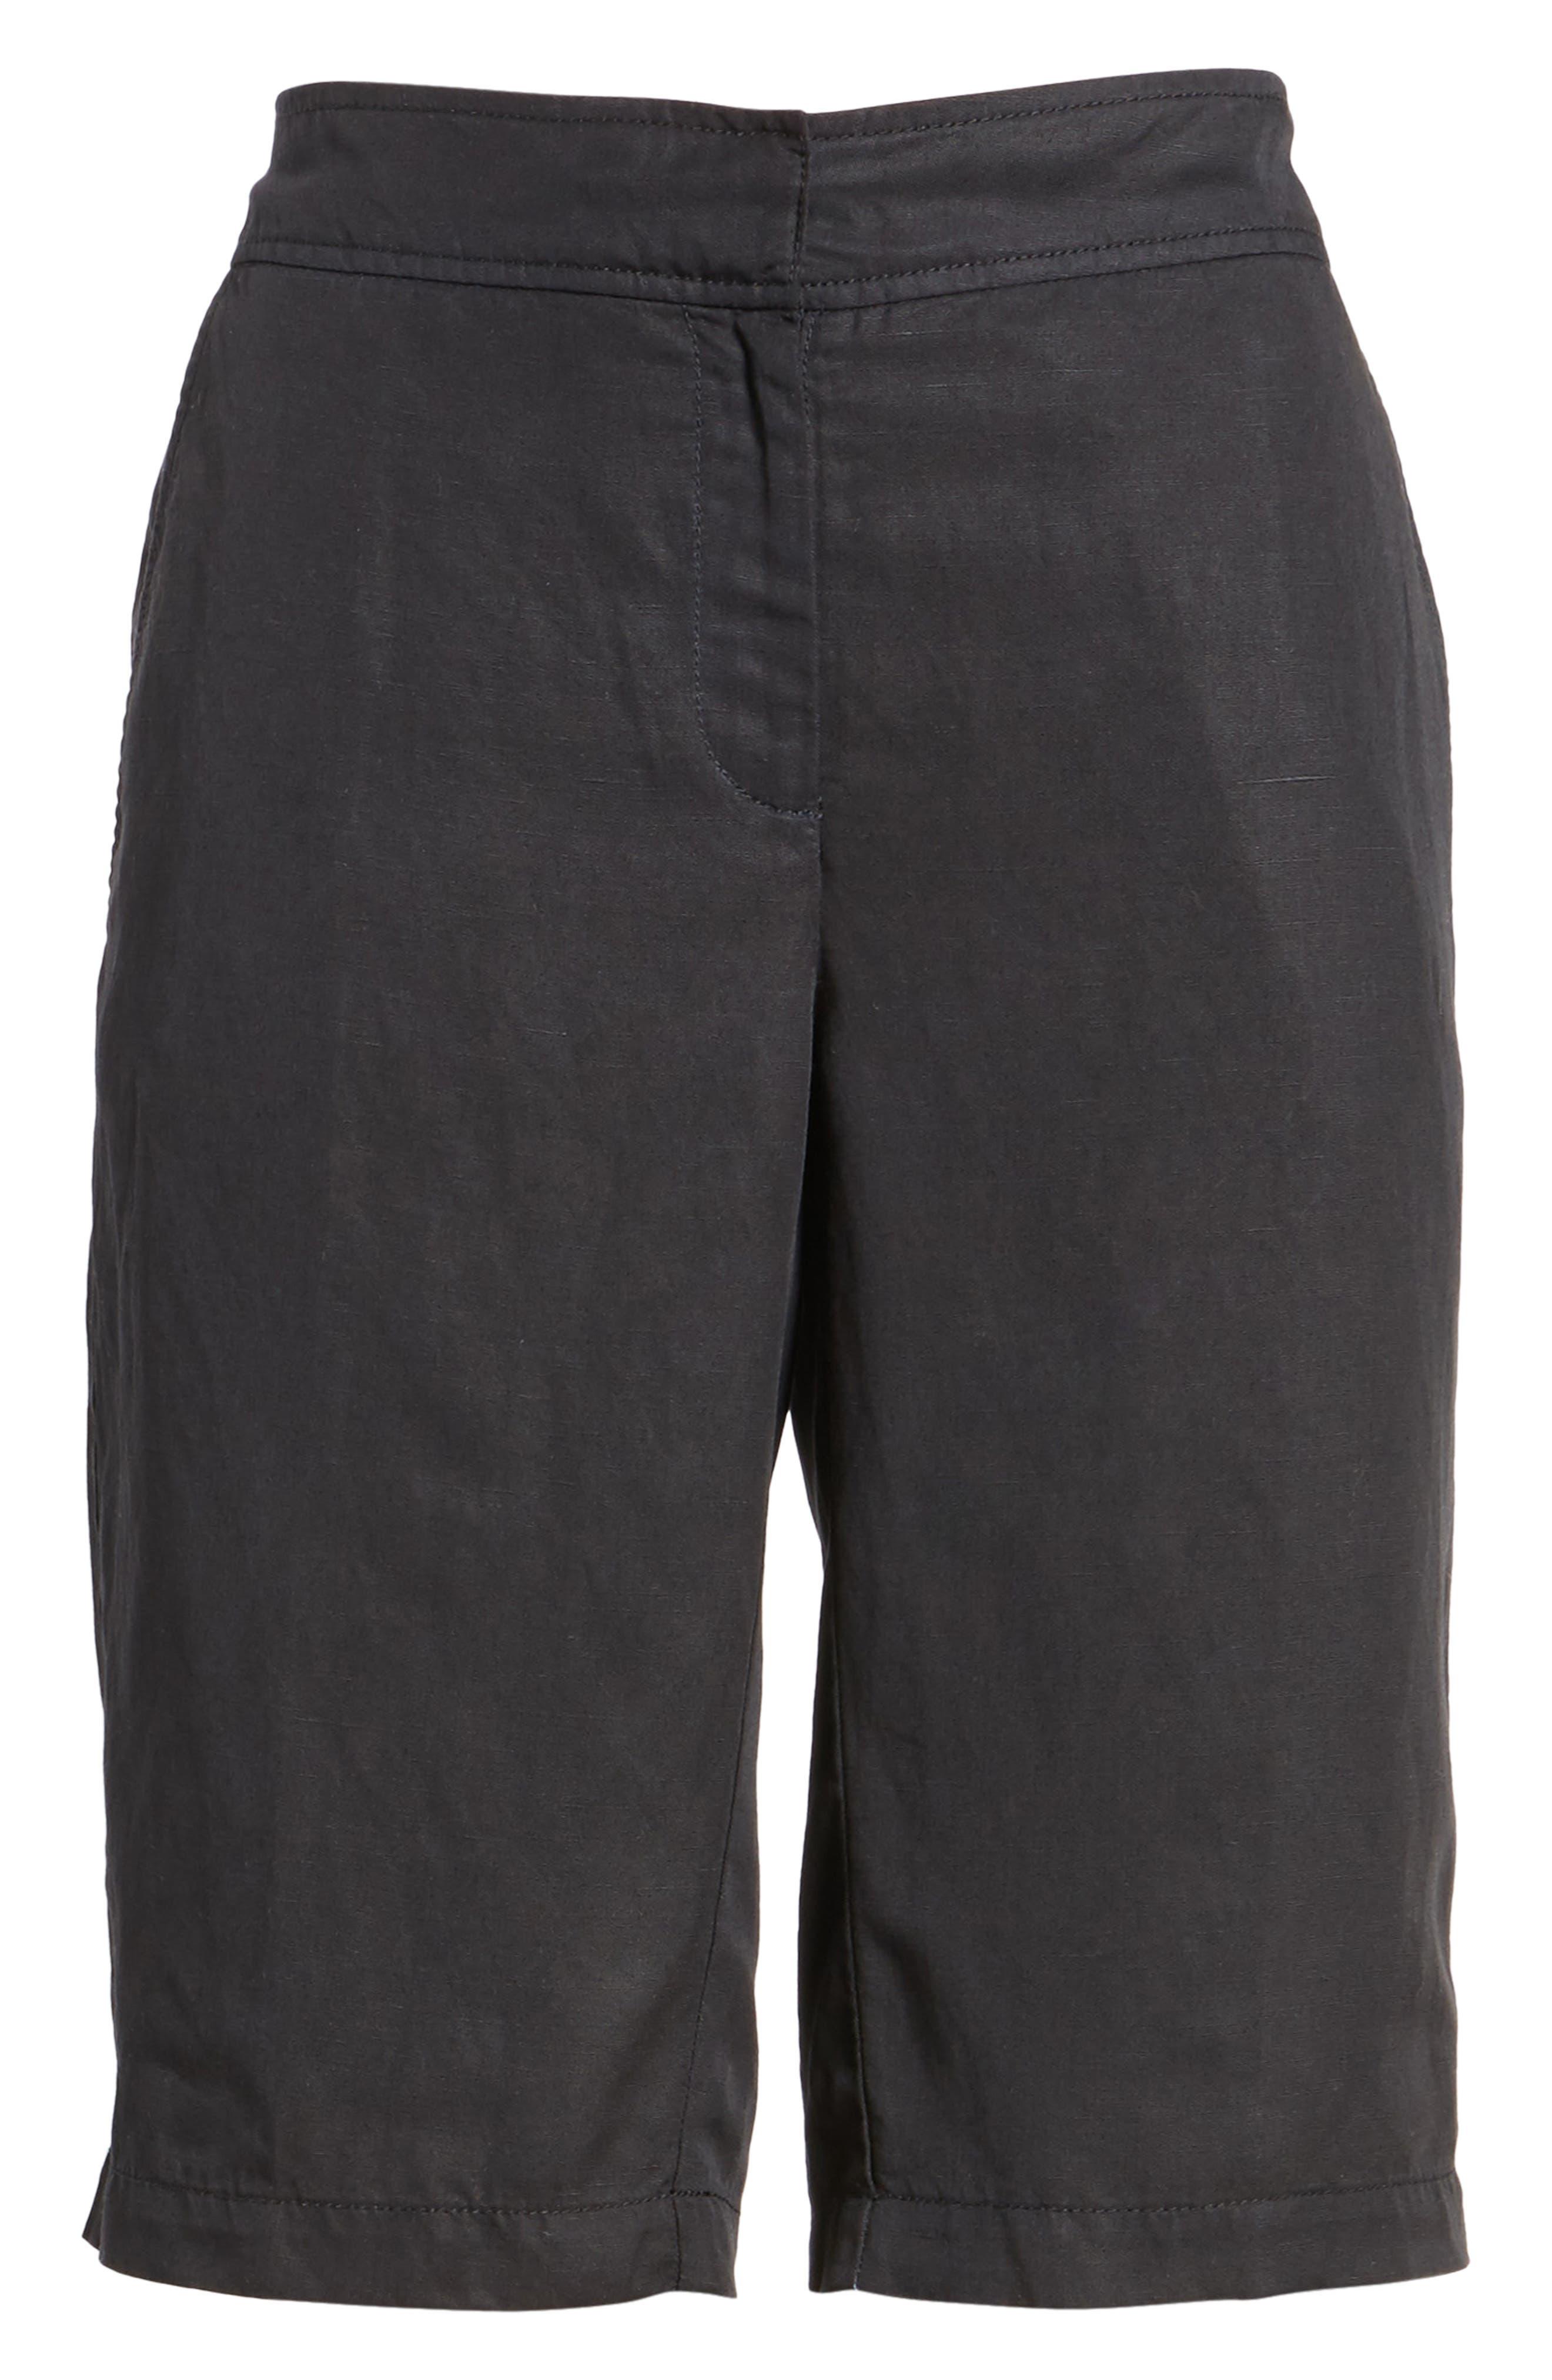 Tencel<sup>®</sup> Lyocell & Linen Walking Shorts,                         Main,                         color, Black